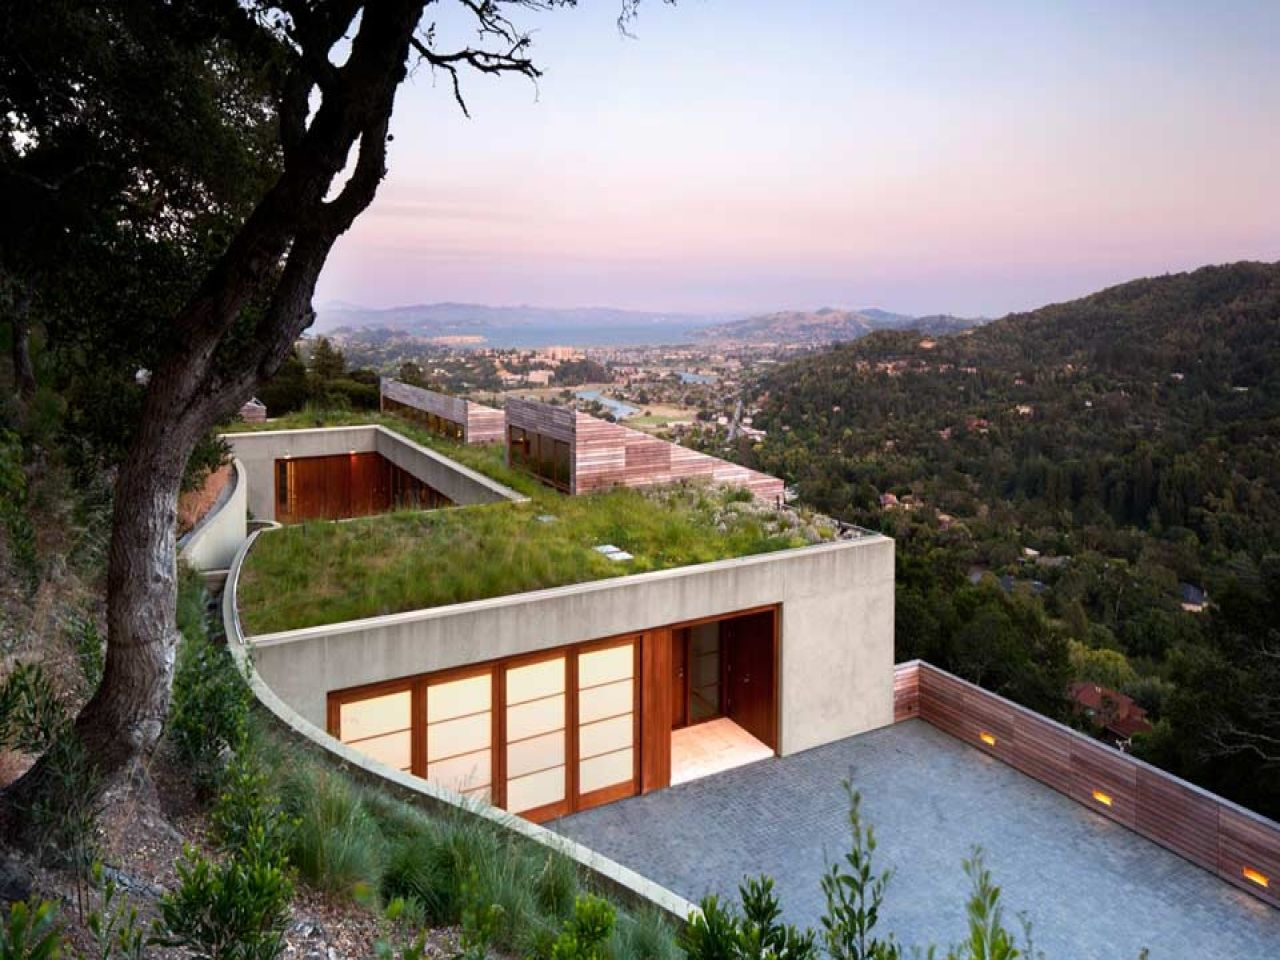 Steep Slope Home Designs Very Steep Hillside House Plans Modern